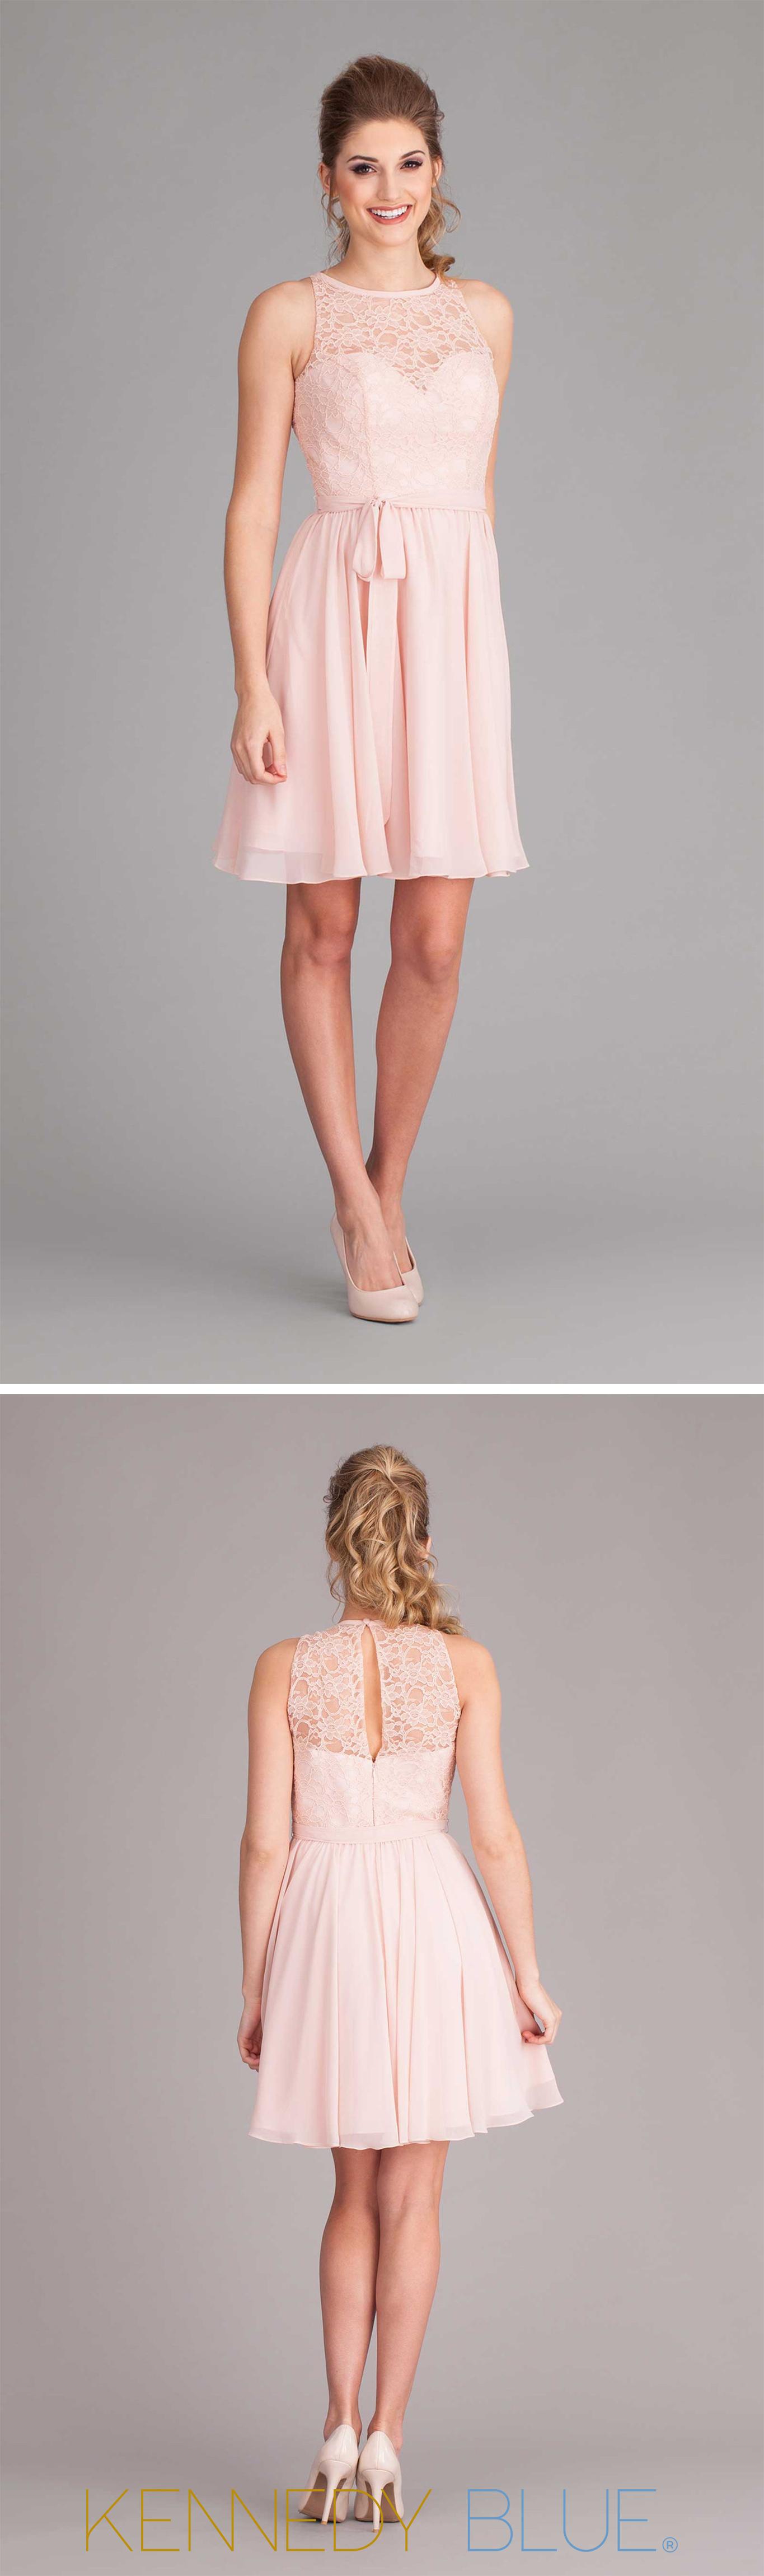 best images about bridesmaid dresses on pinterest